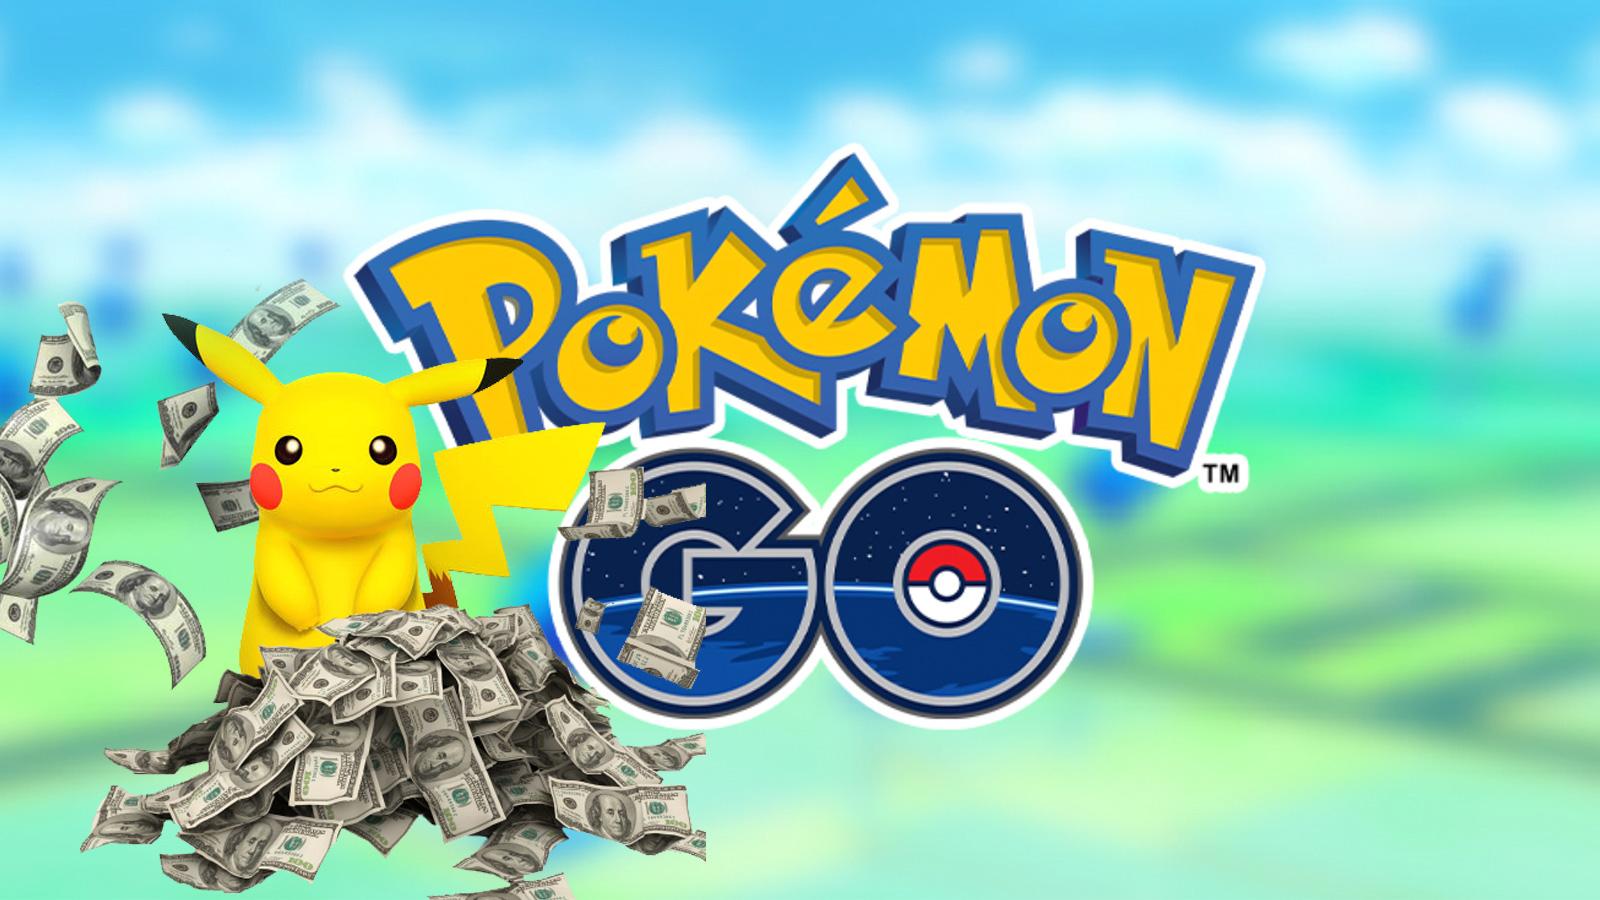 Screenshot of Pikachu with money pile over Pokemon Go logo.